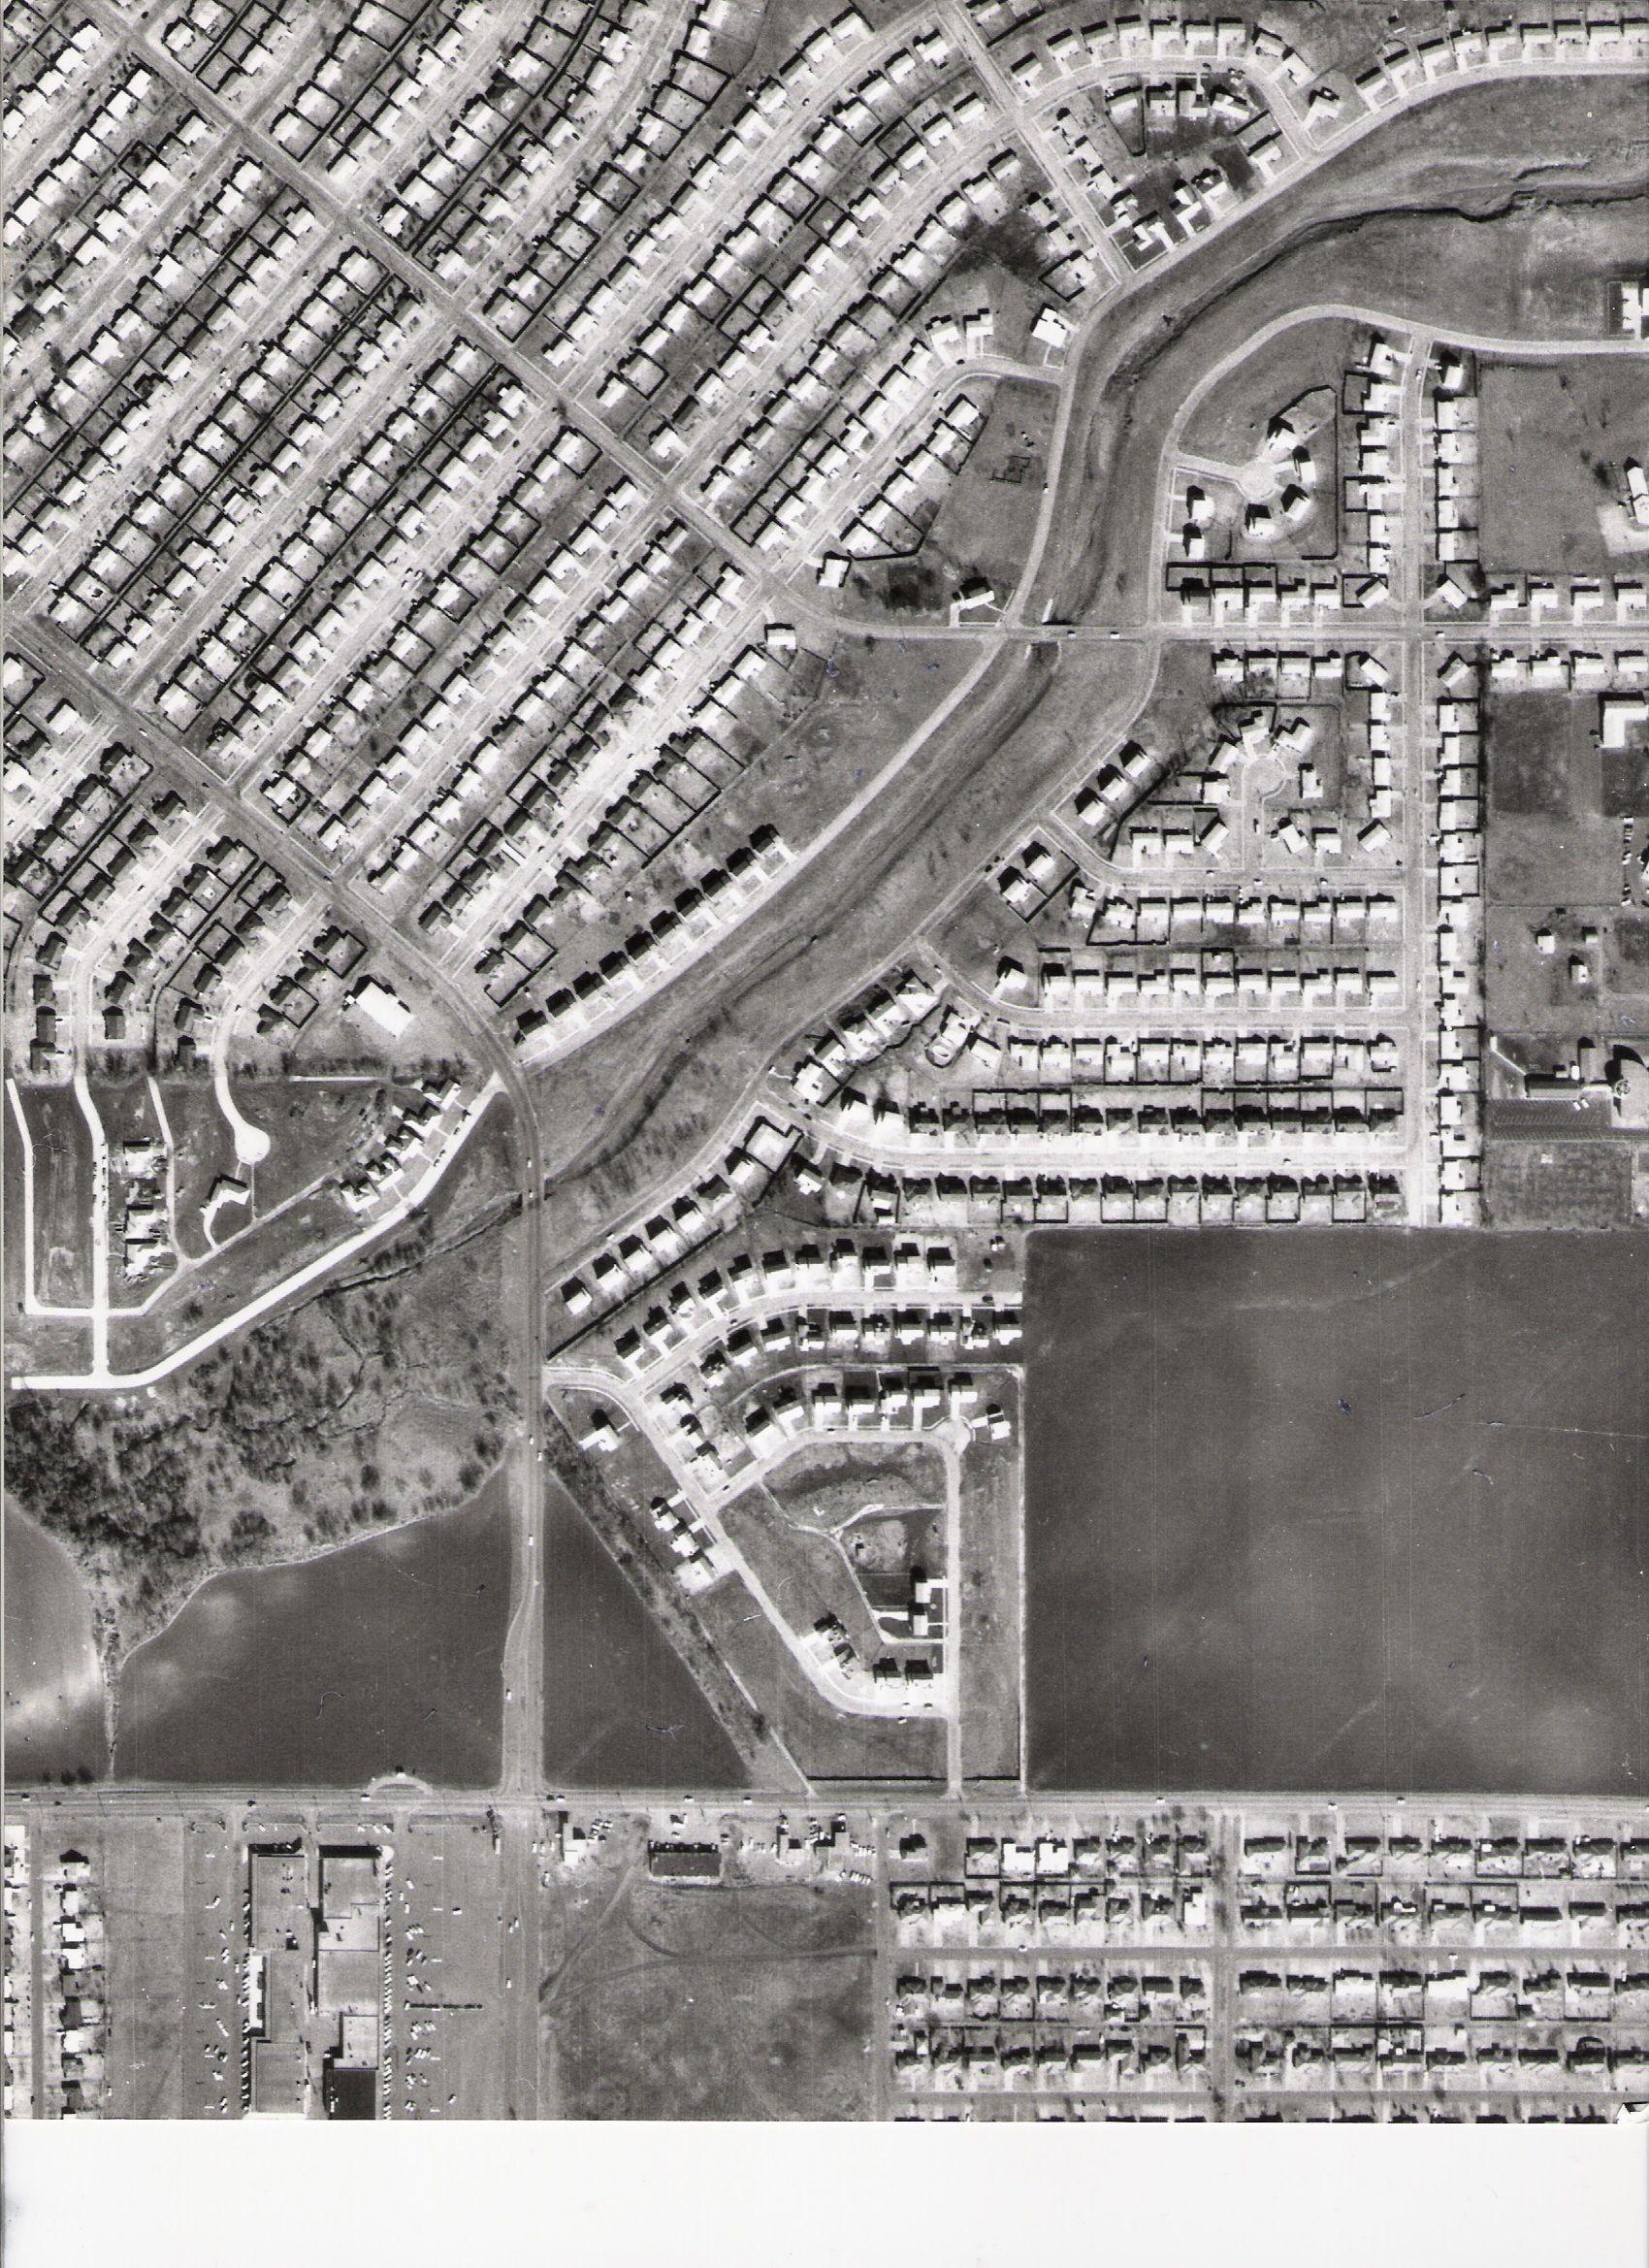 Jan_2_1964_Aerial_Photo_FB.jpg (1700×2338)